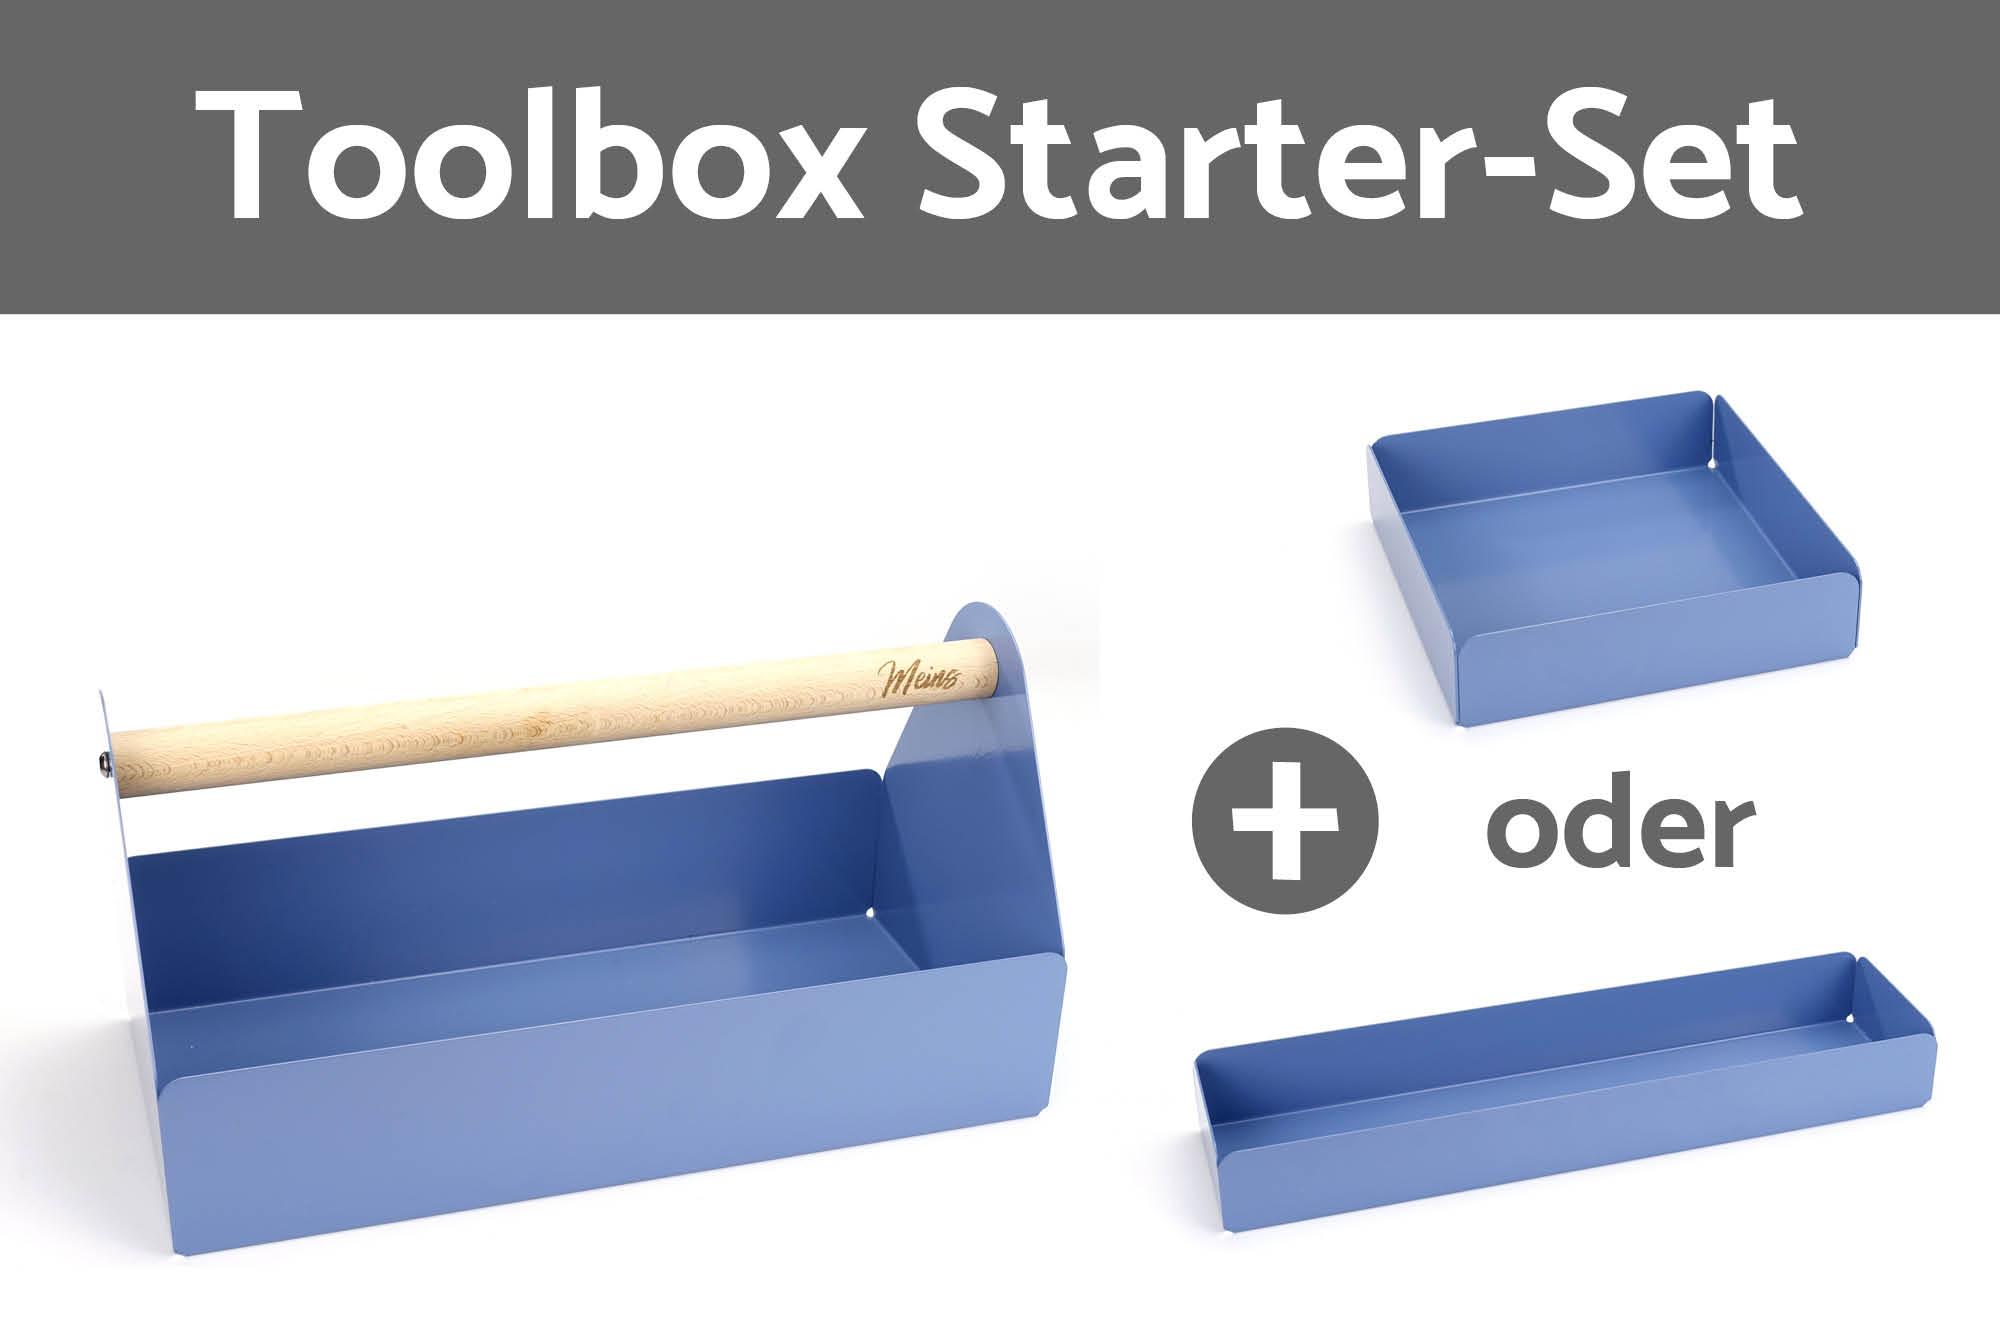 Naehgedoens-design-toolbox-starter-set